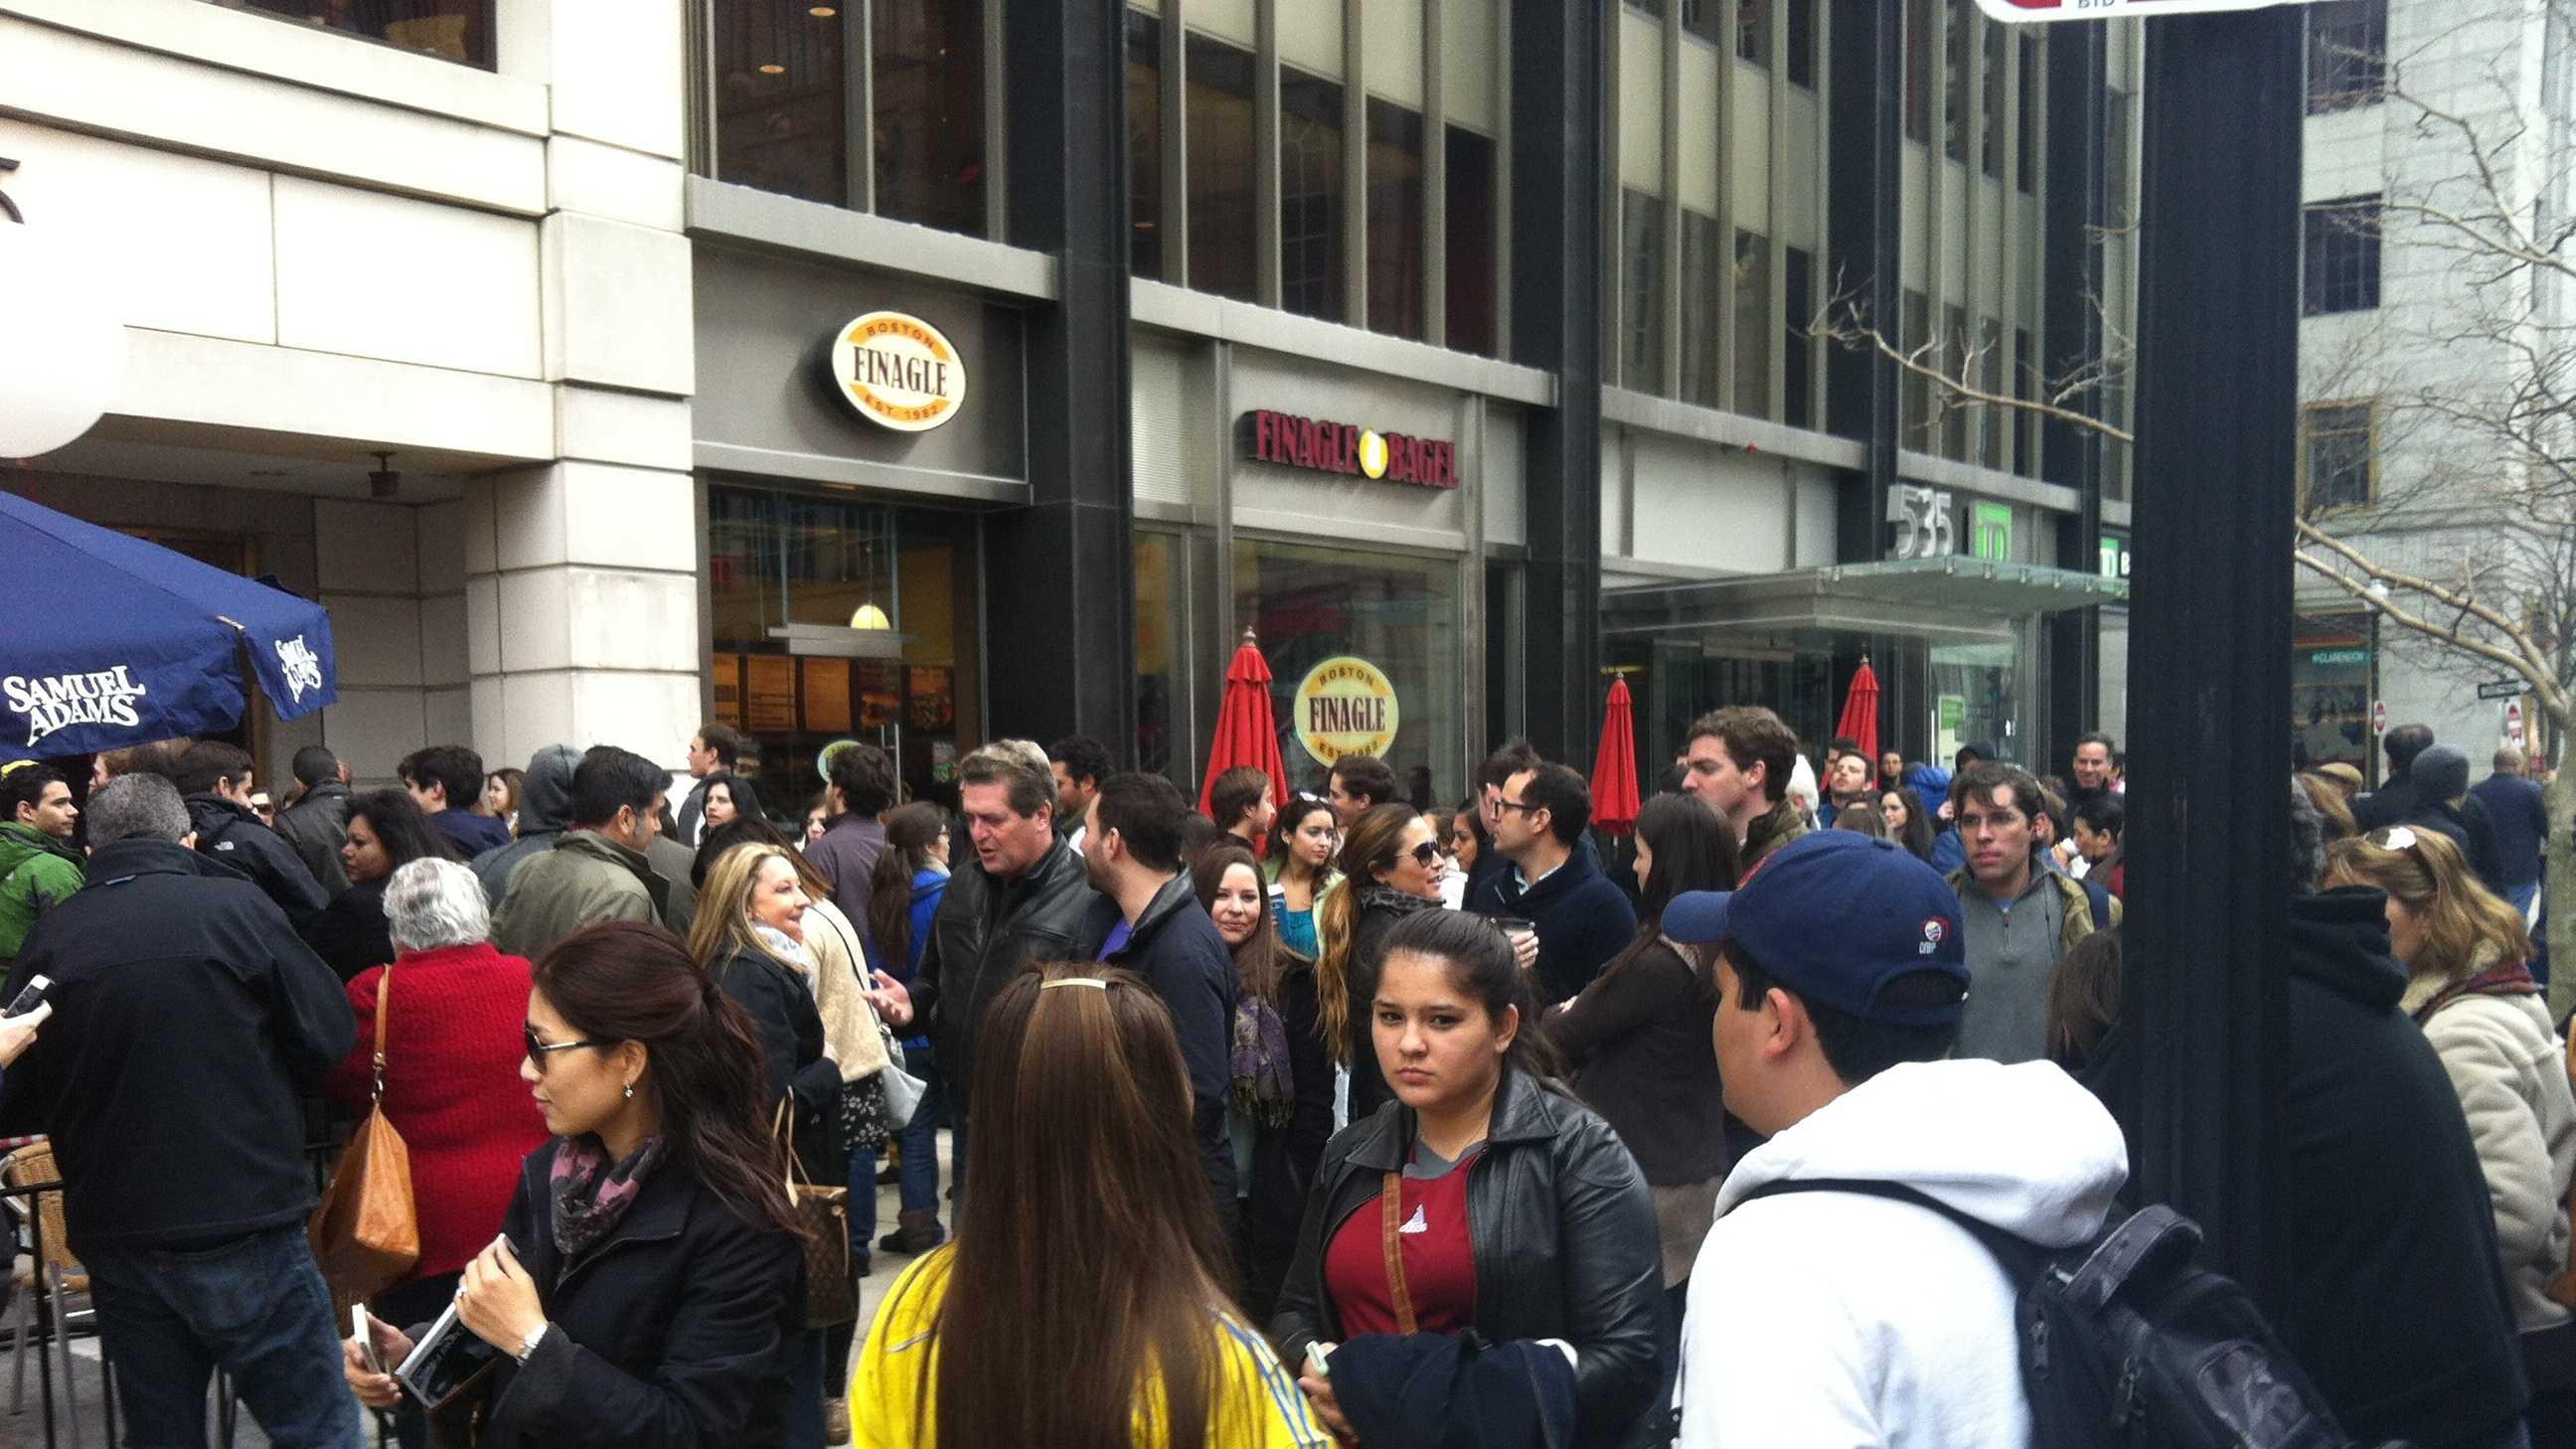 Venezuelans cast absentee votes at Boston embassy